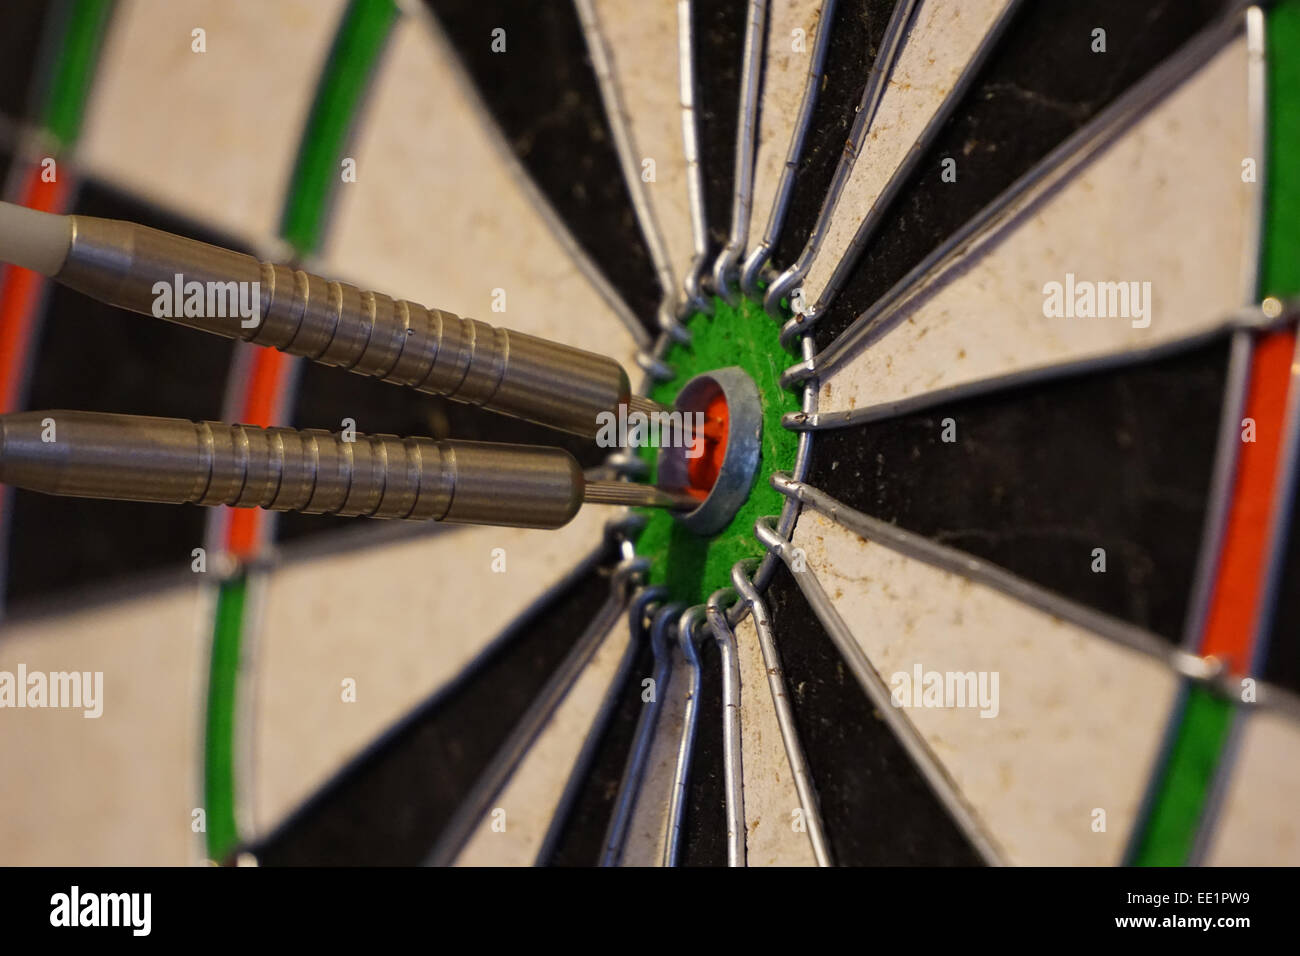 Two darts in the bulls eye of a dart board. - Stock Image